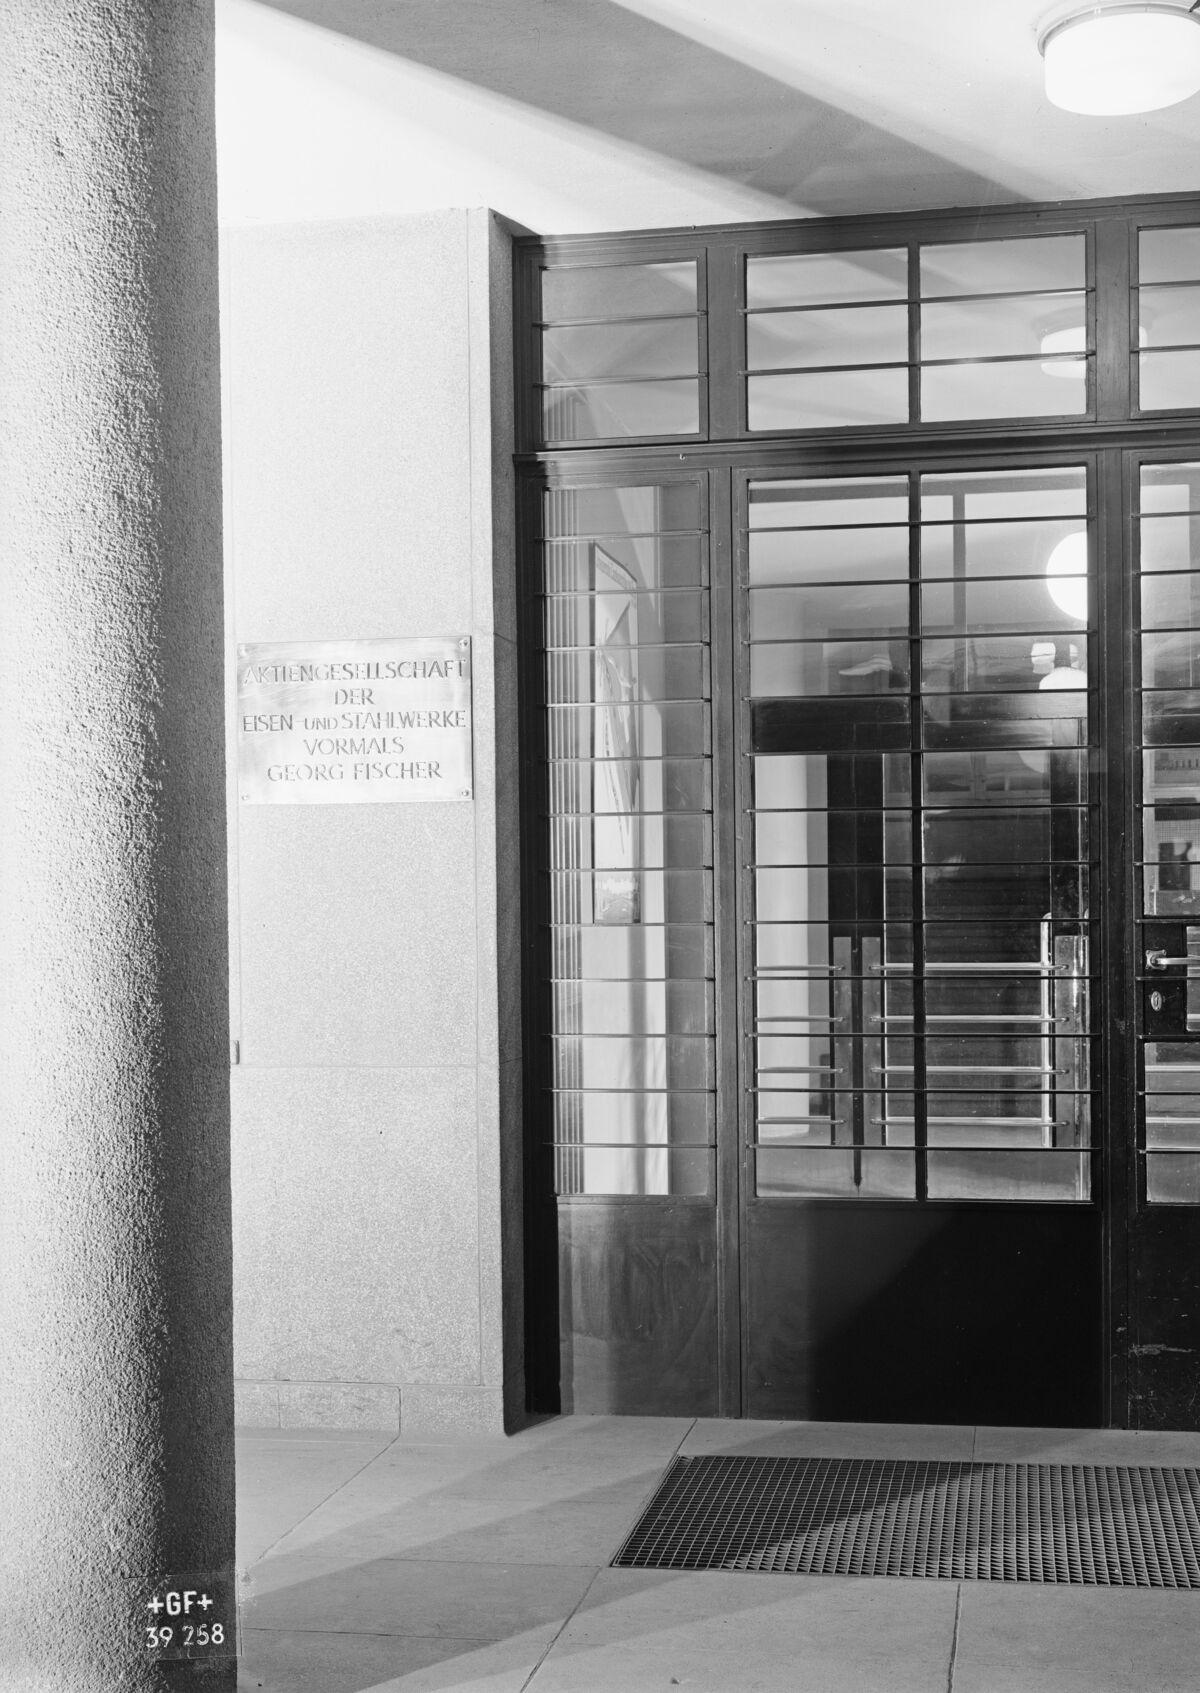 GFA 16/39258: Entrance administration building, Mühlental